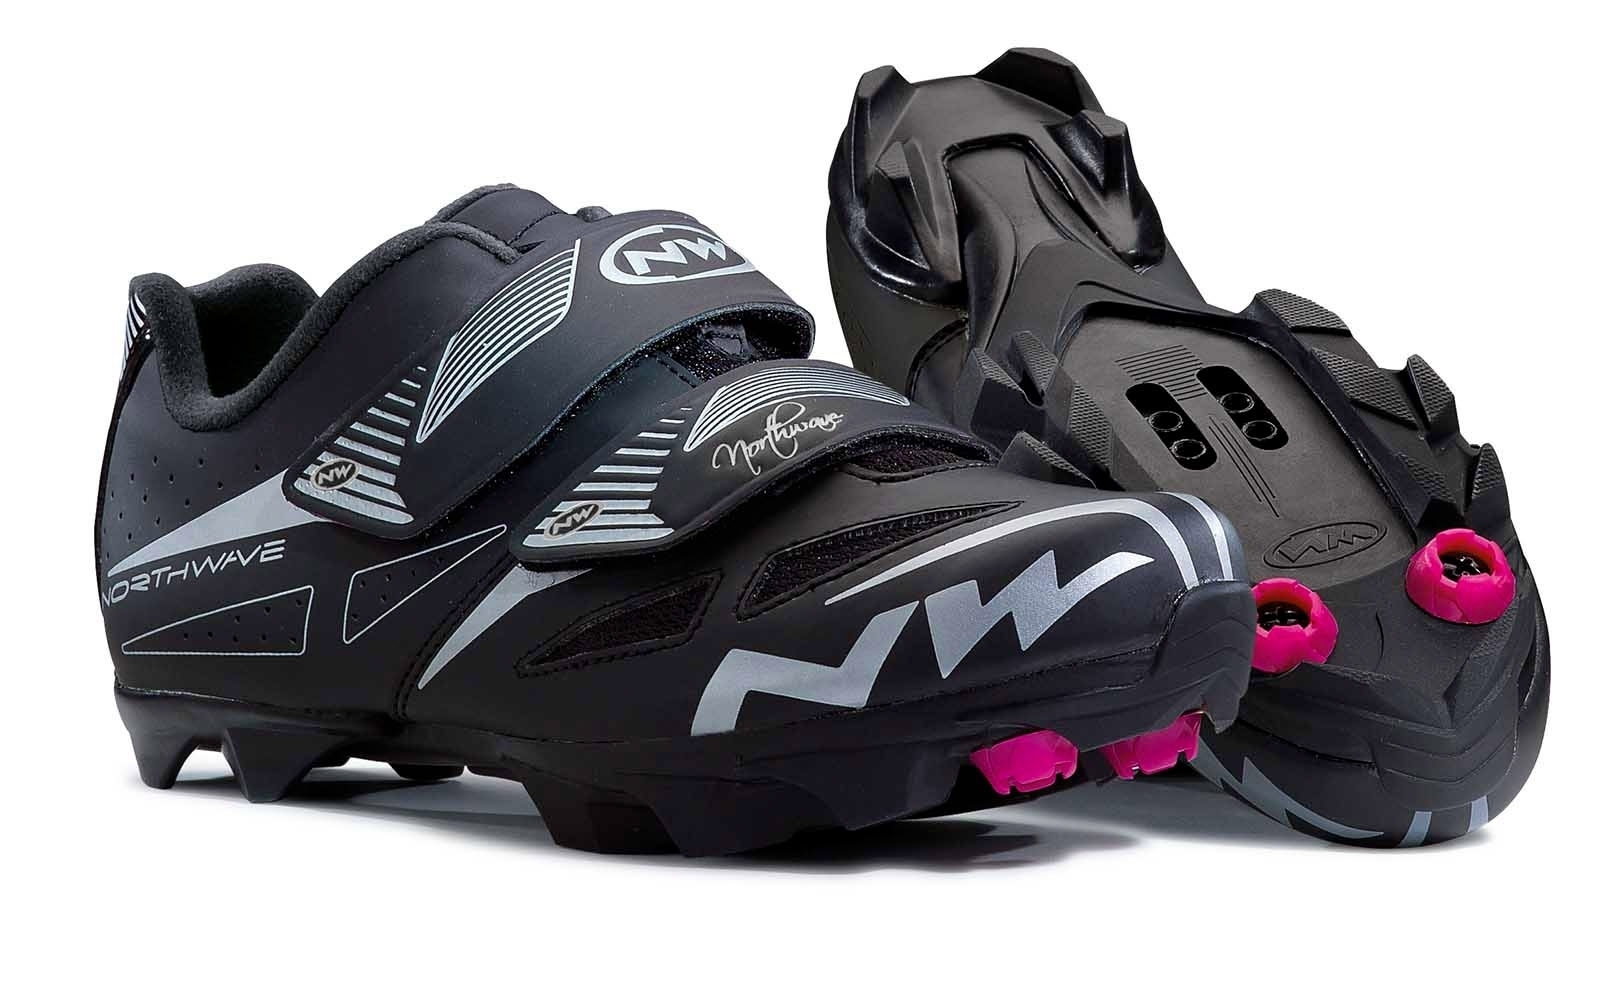 Best price Northwave Woman MTB shoes ELISIR EVO Italy2us.com